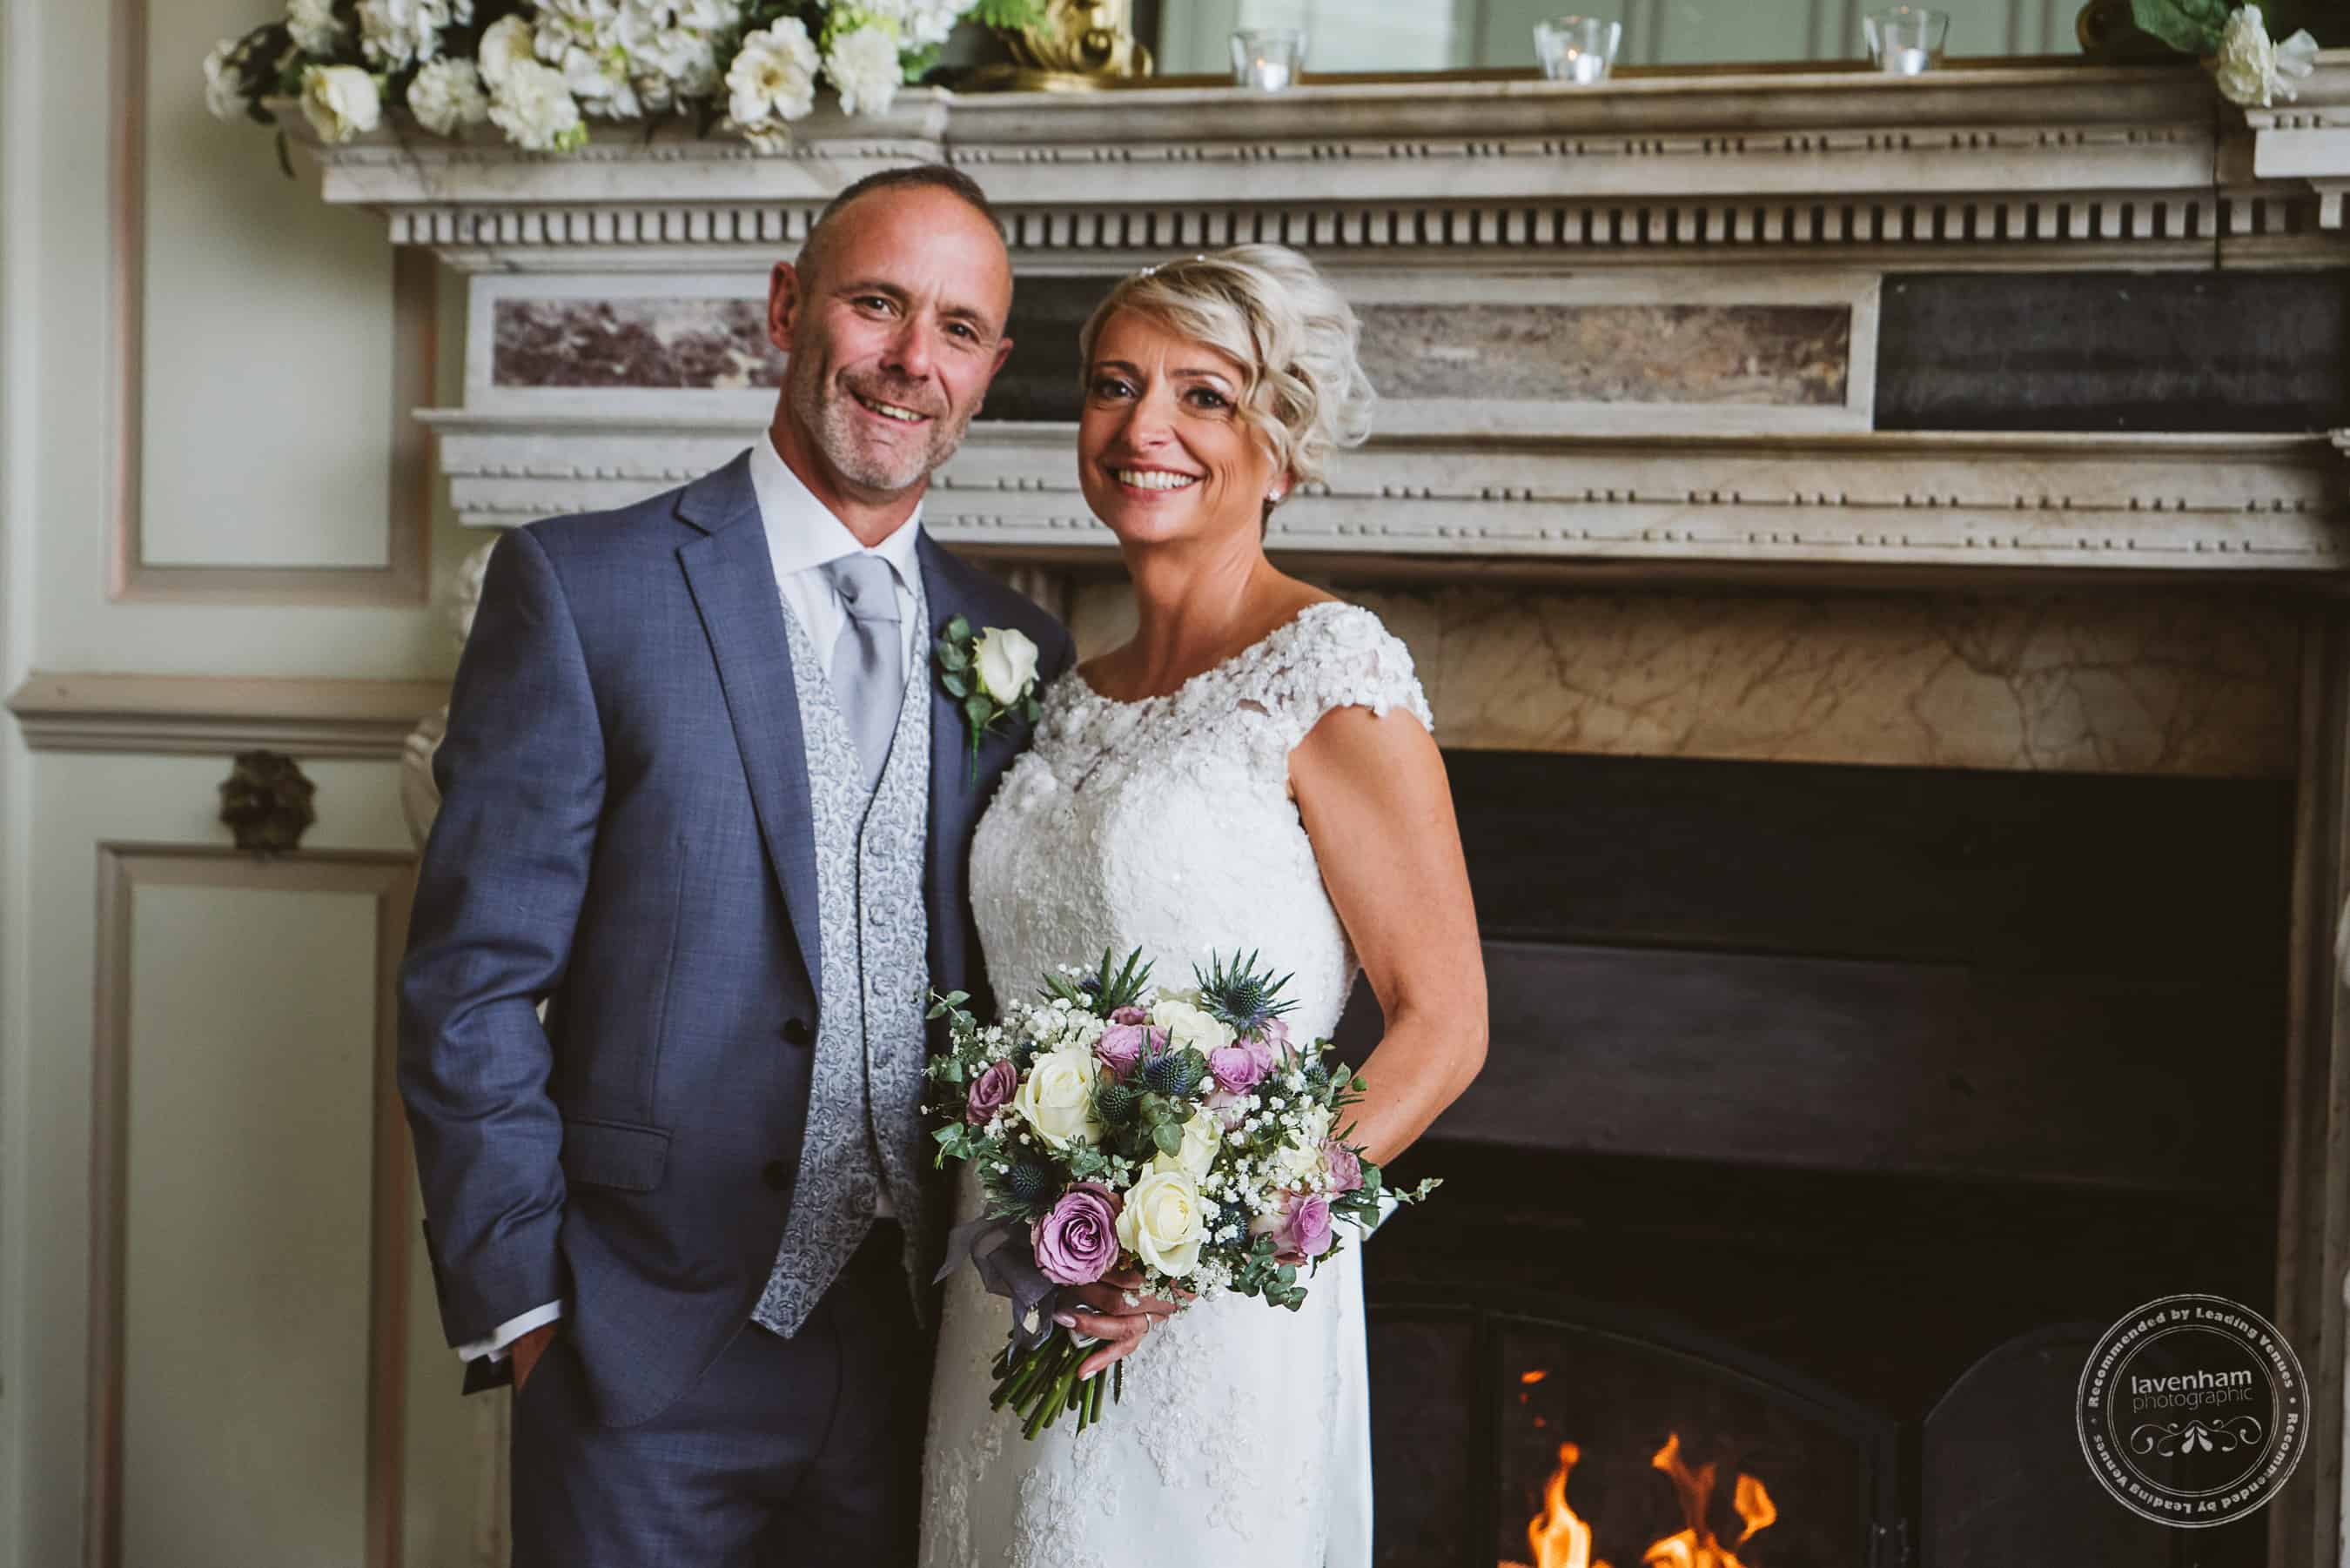 281018 Gosfield Hall Wedding Photography Lavenham Photographic 063